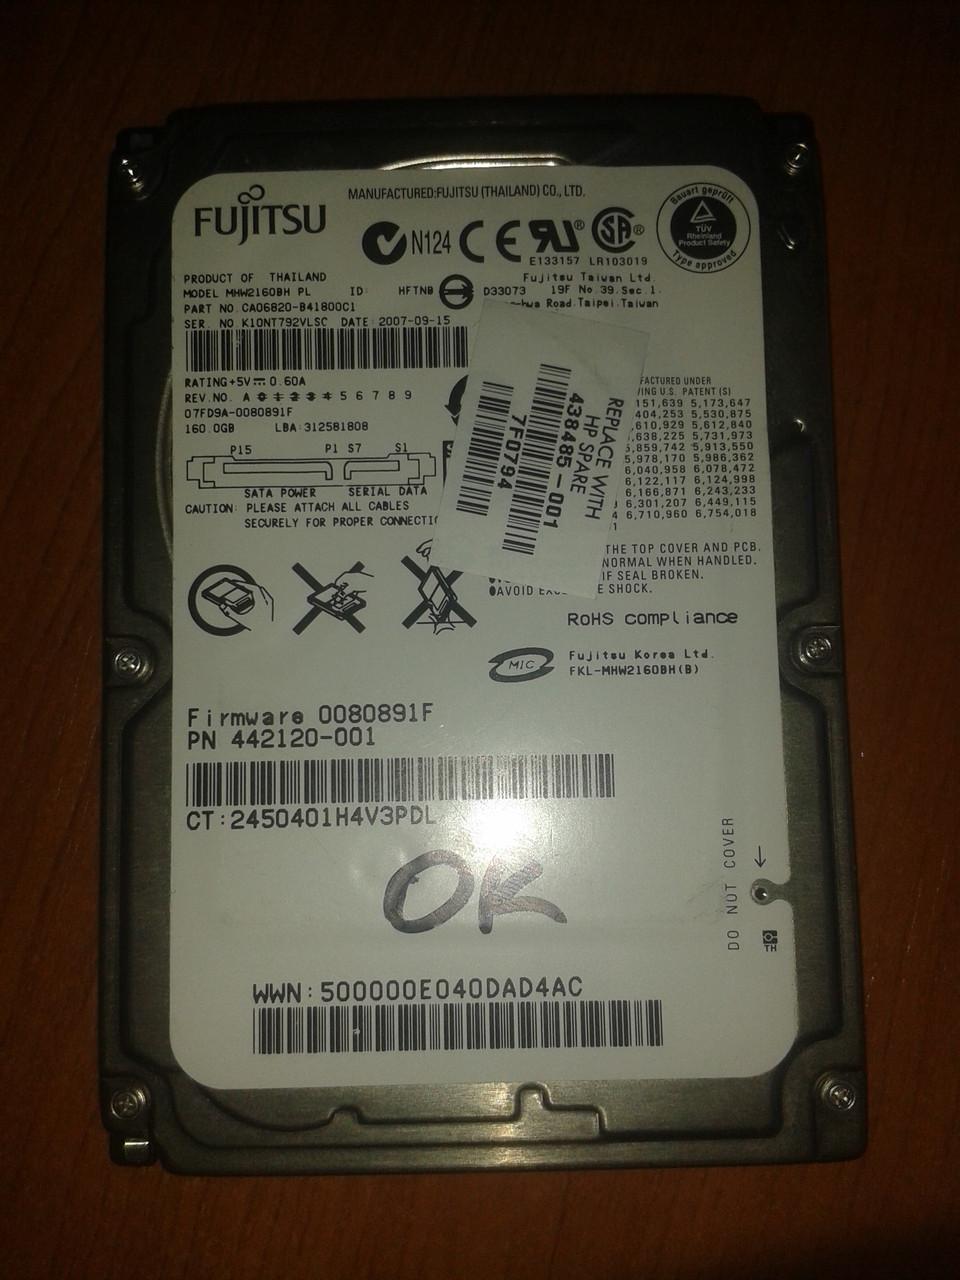 "Жесткий диск Fujitsu 160GB 5400rpm 8MB MHW2160BH SATA, 2.5"" б/у"